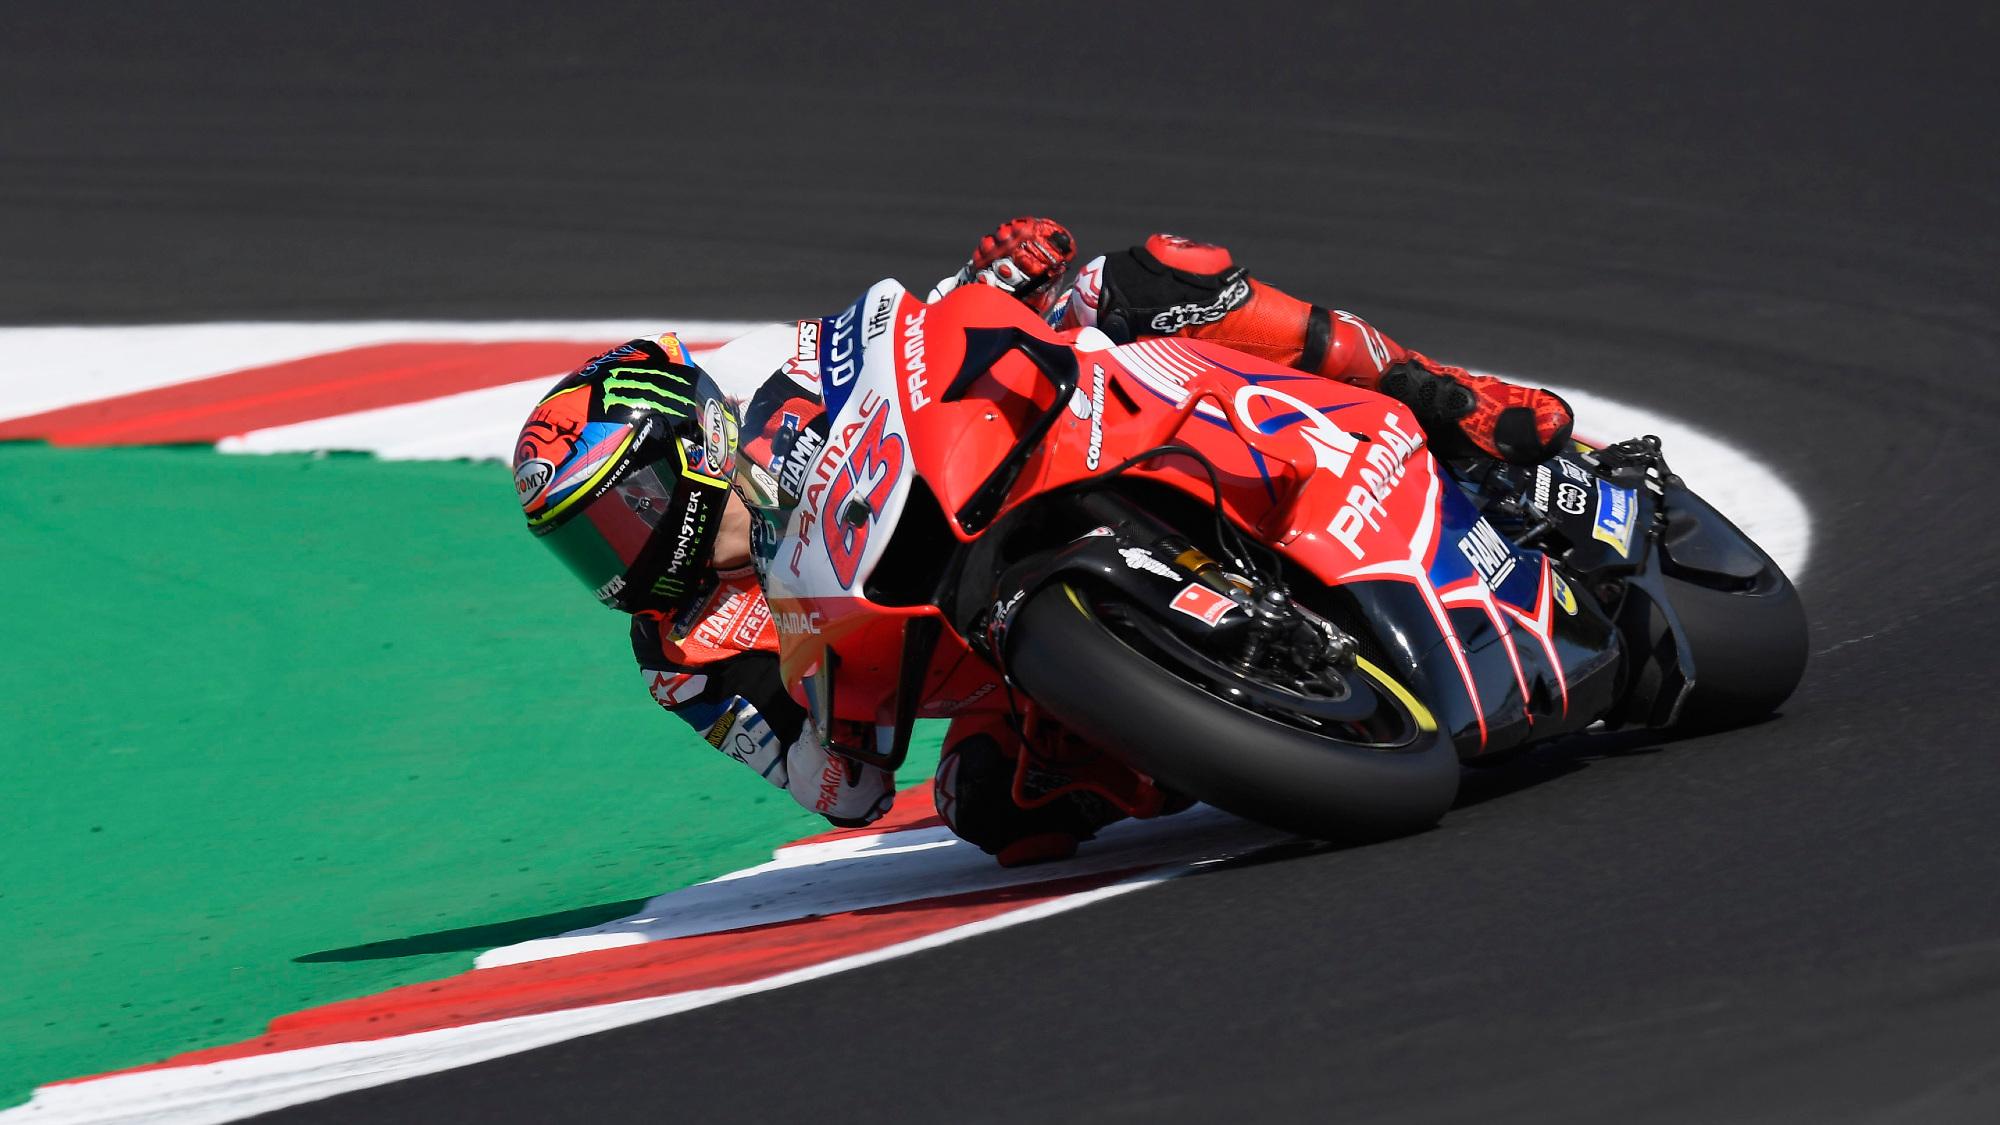 Francesco Bagnaia, Ducati MotoGP 2020